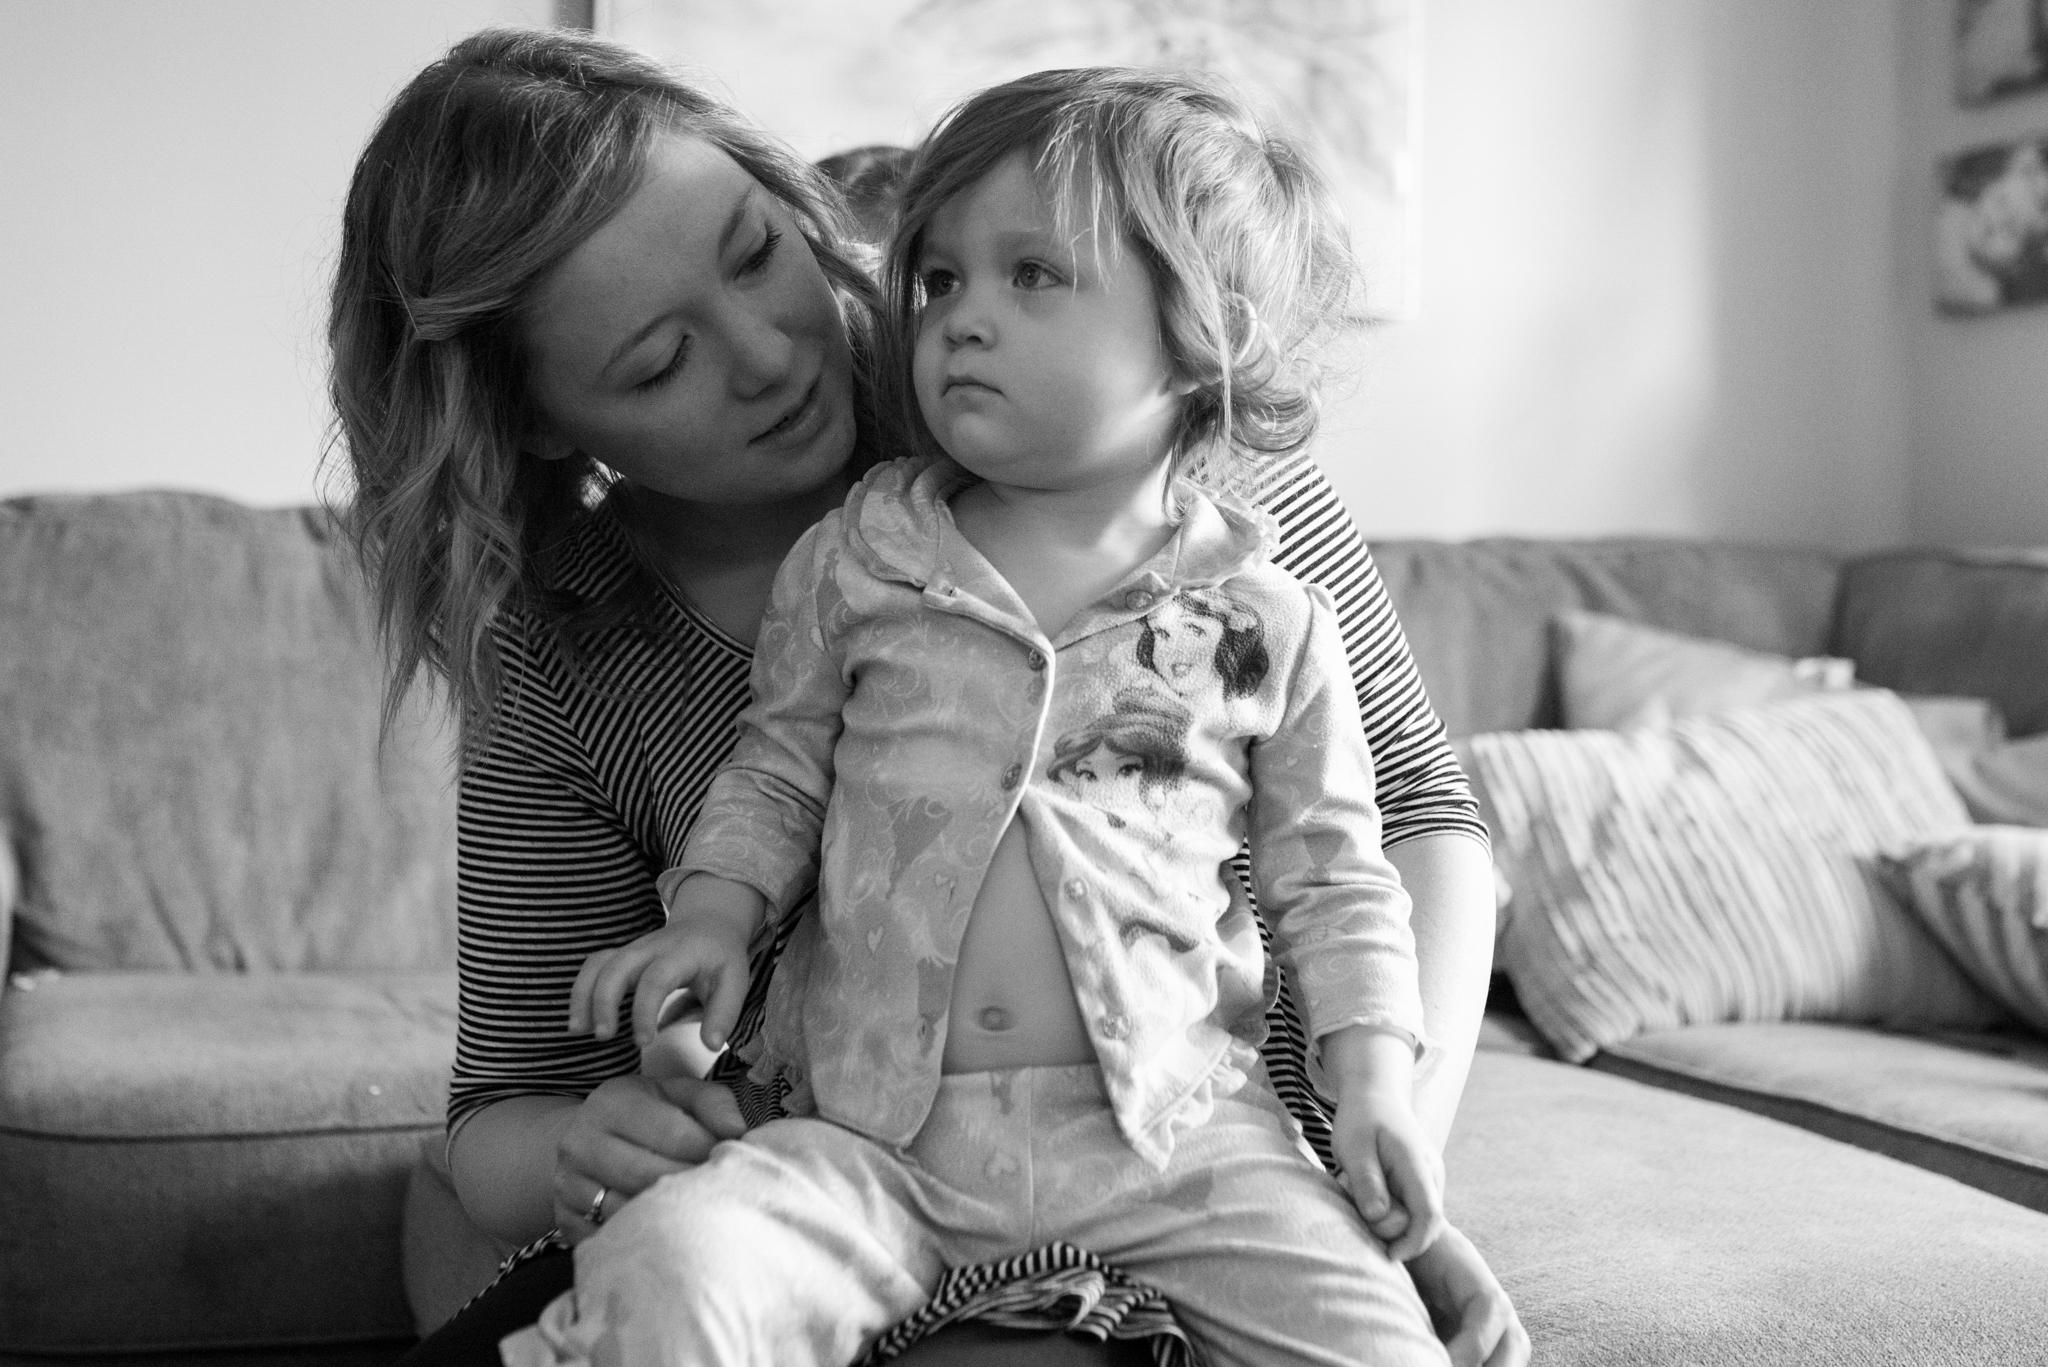 Mom holding daughter on lap, daughter in pajamas